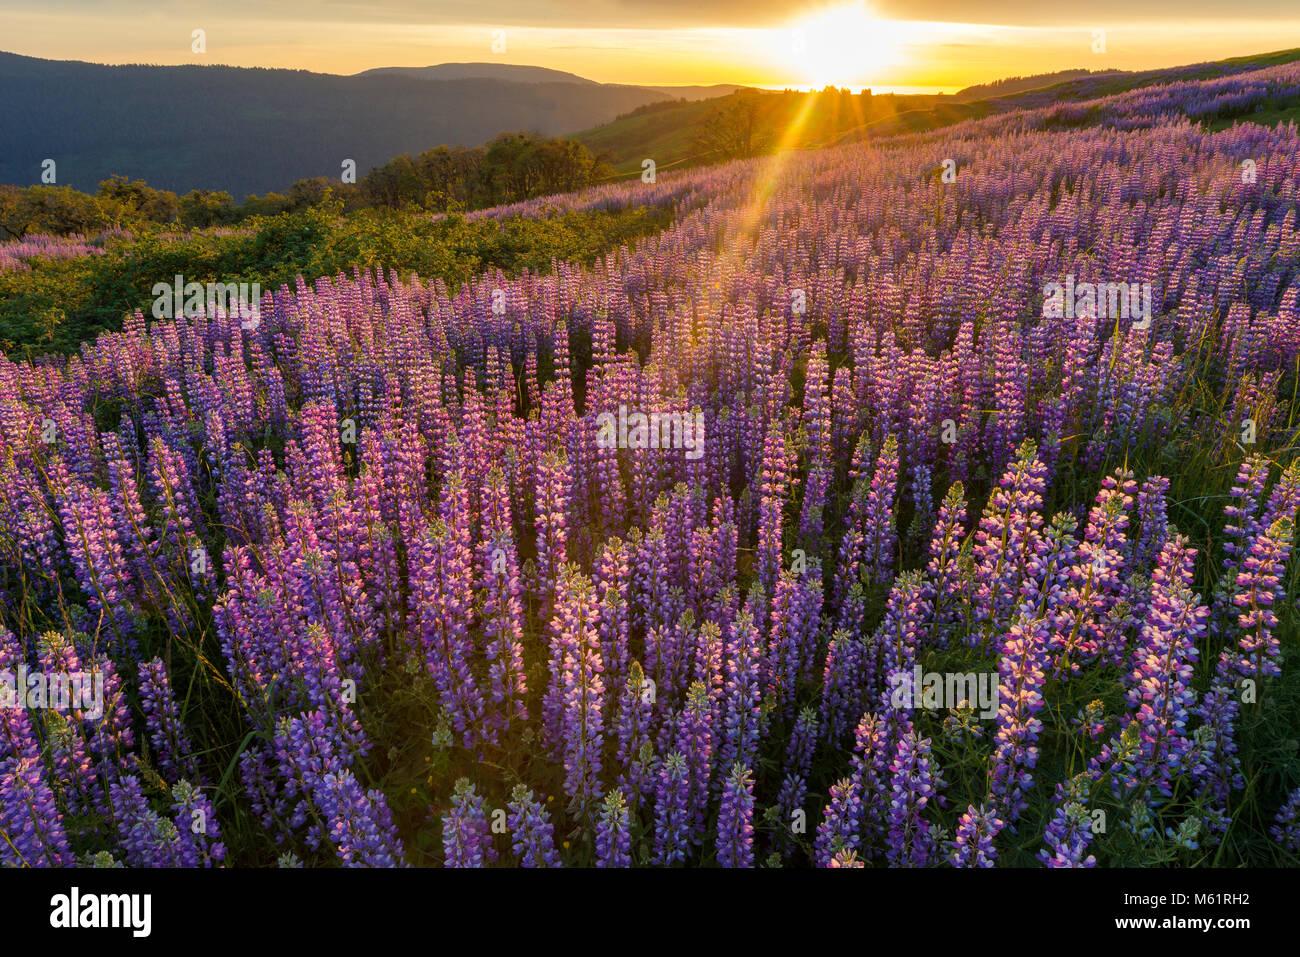 Tramonto, Lupin, Lupinus angustifolius, Childs Hill Prairie, Parco Nazionale di Redwood in California Immagini Stock